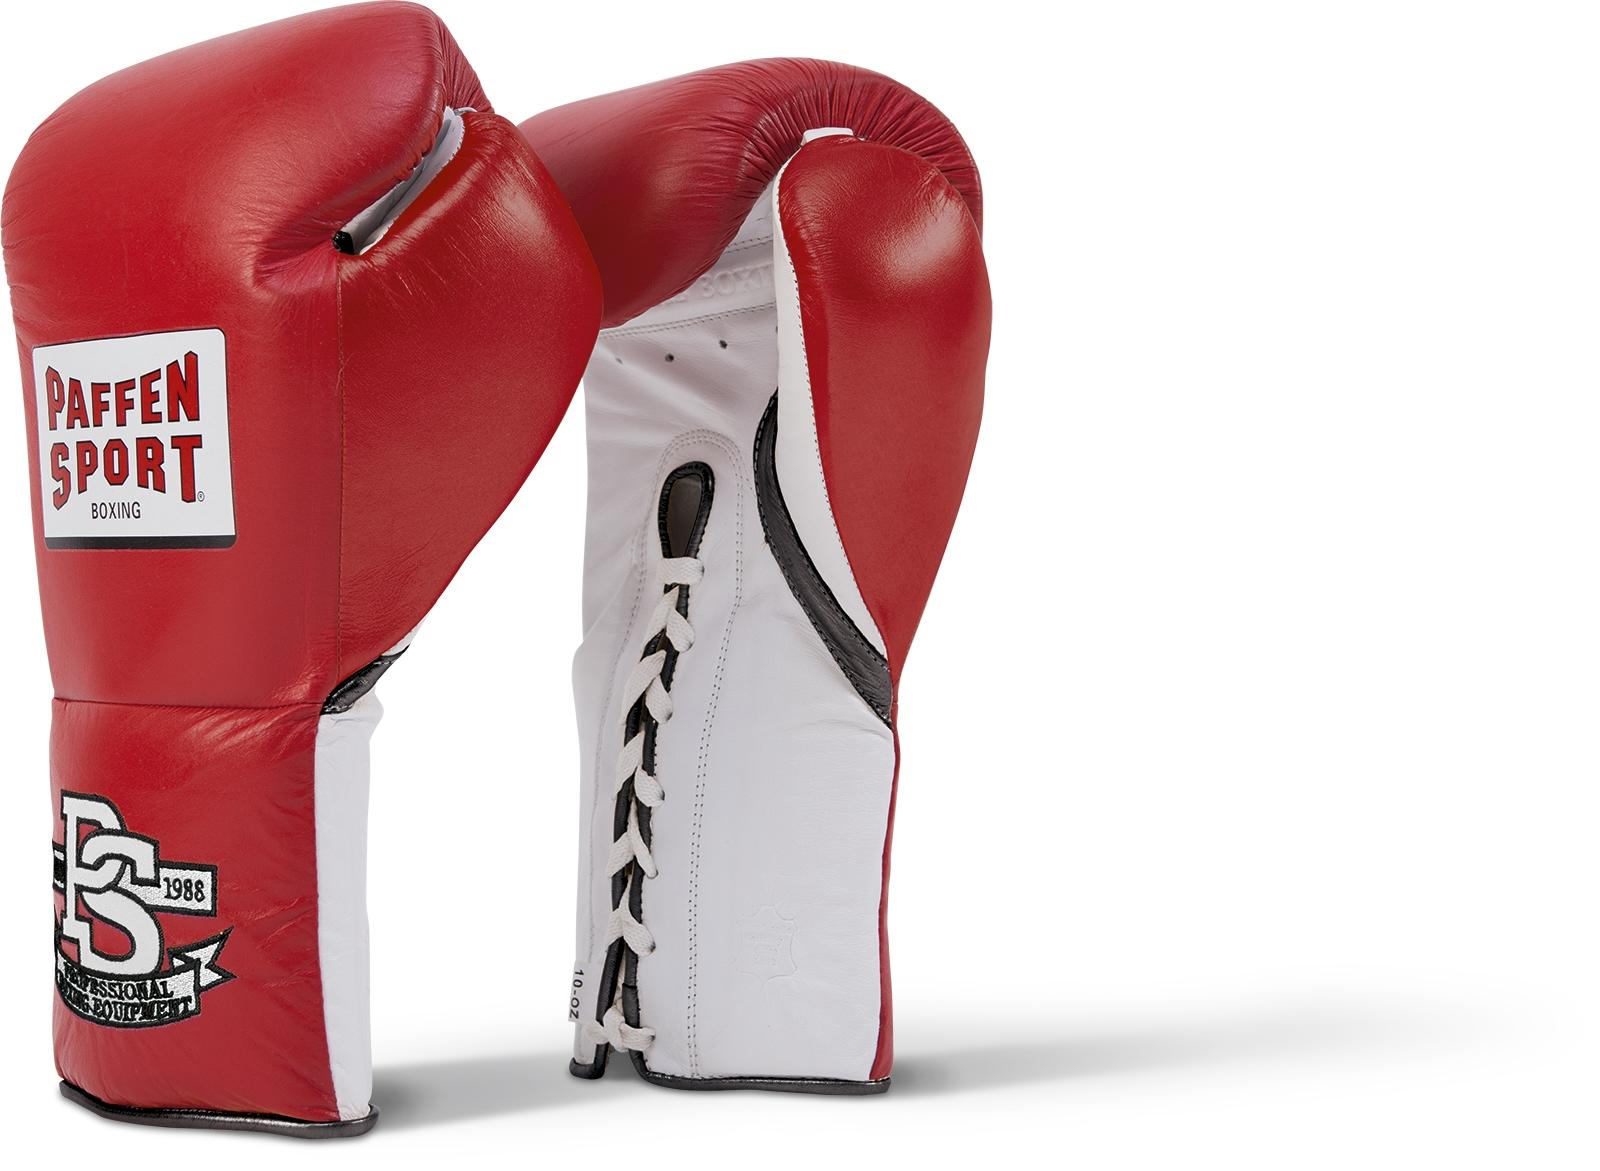 Paffen Sport Pro Mexican Bokshandschoenen - Rood / Wit / Zwart - 10 oz